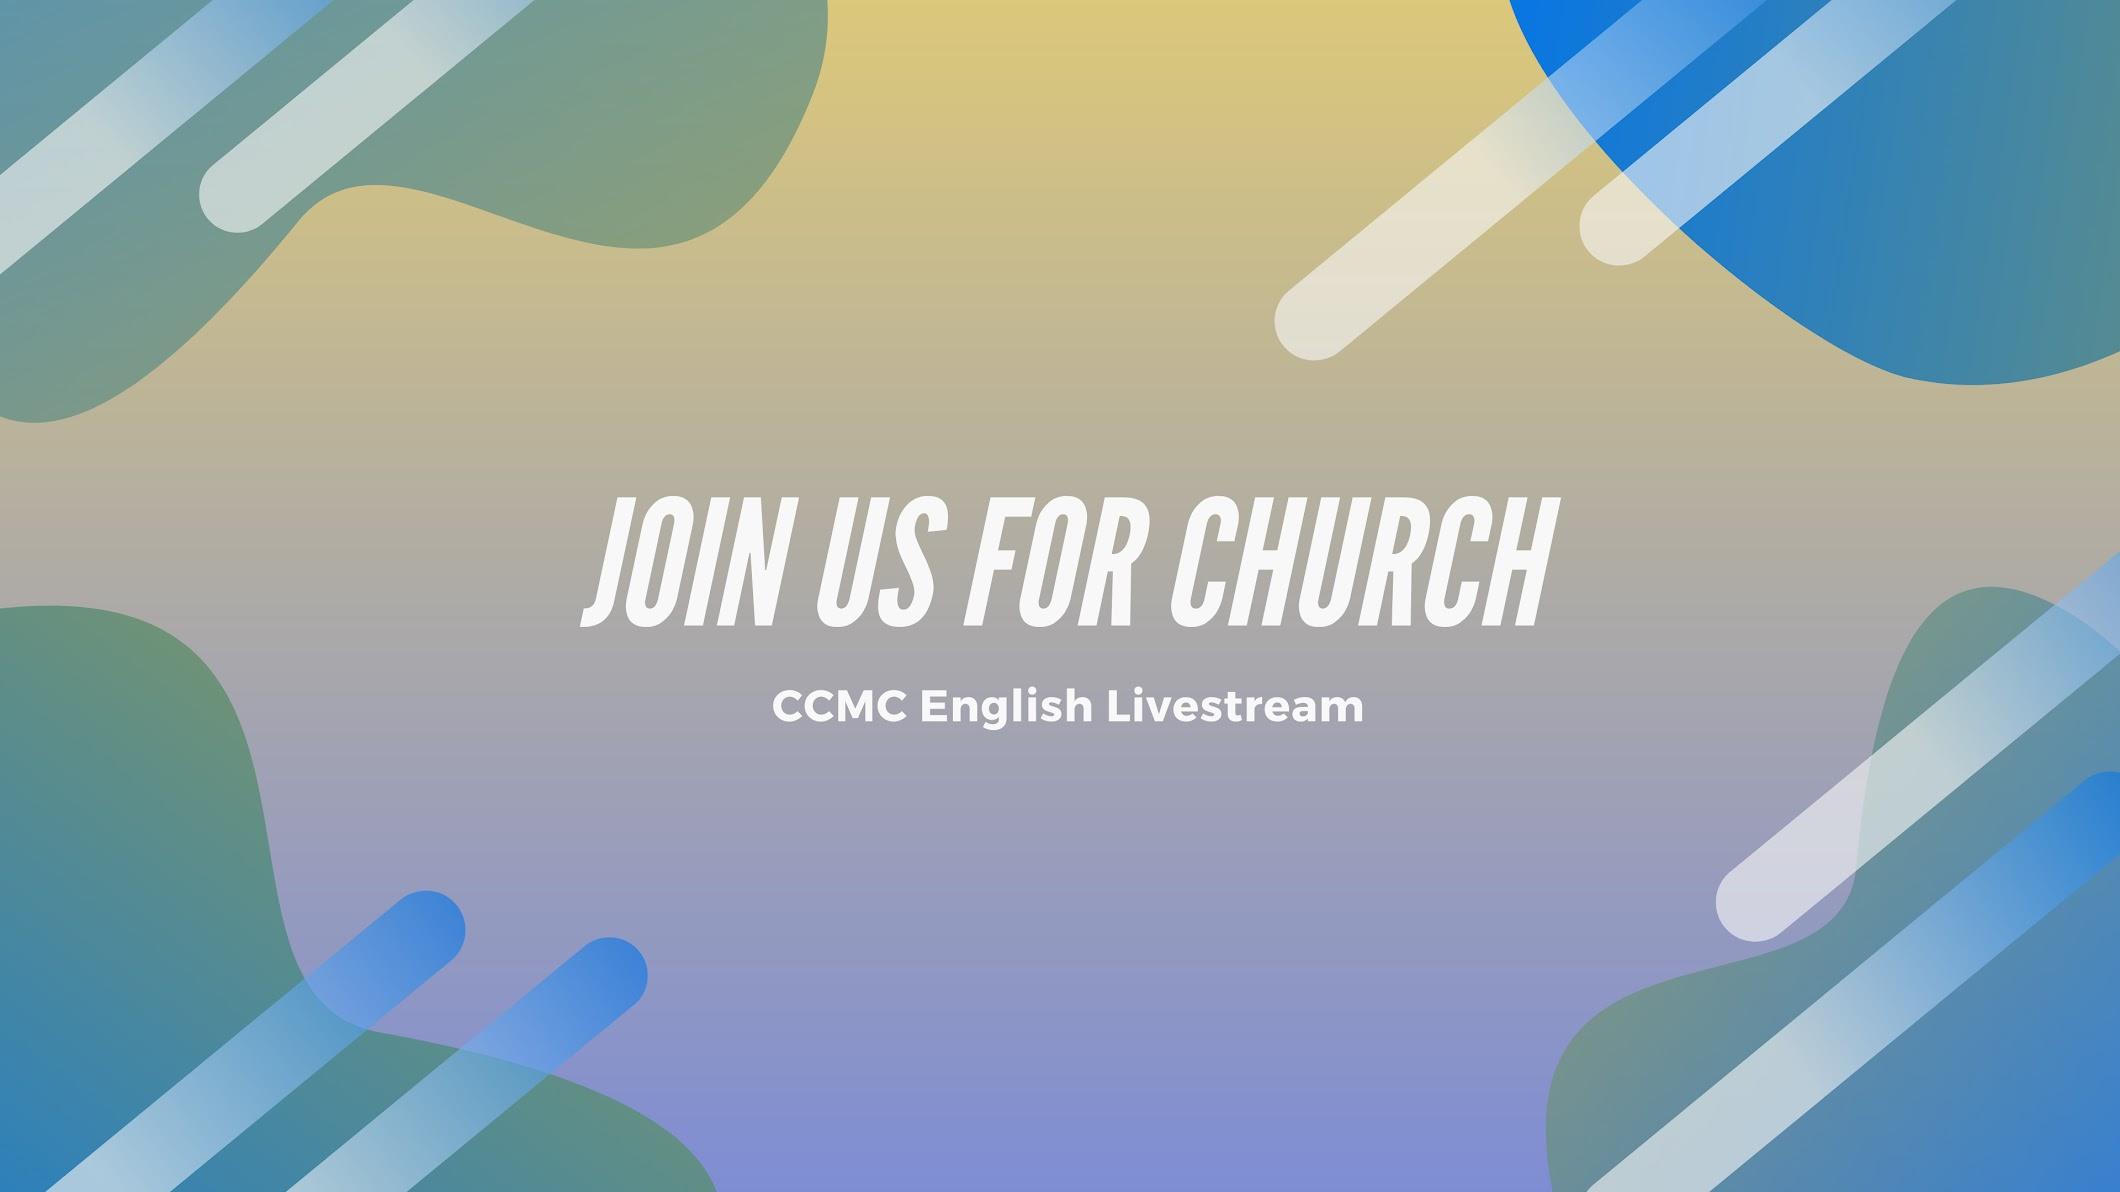 CCMC English YouTube Channel